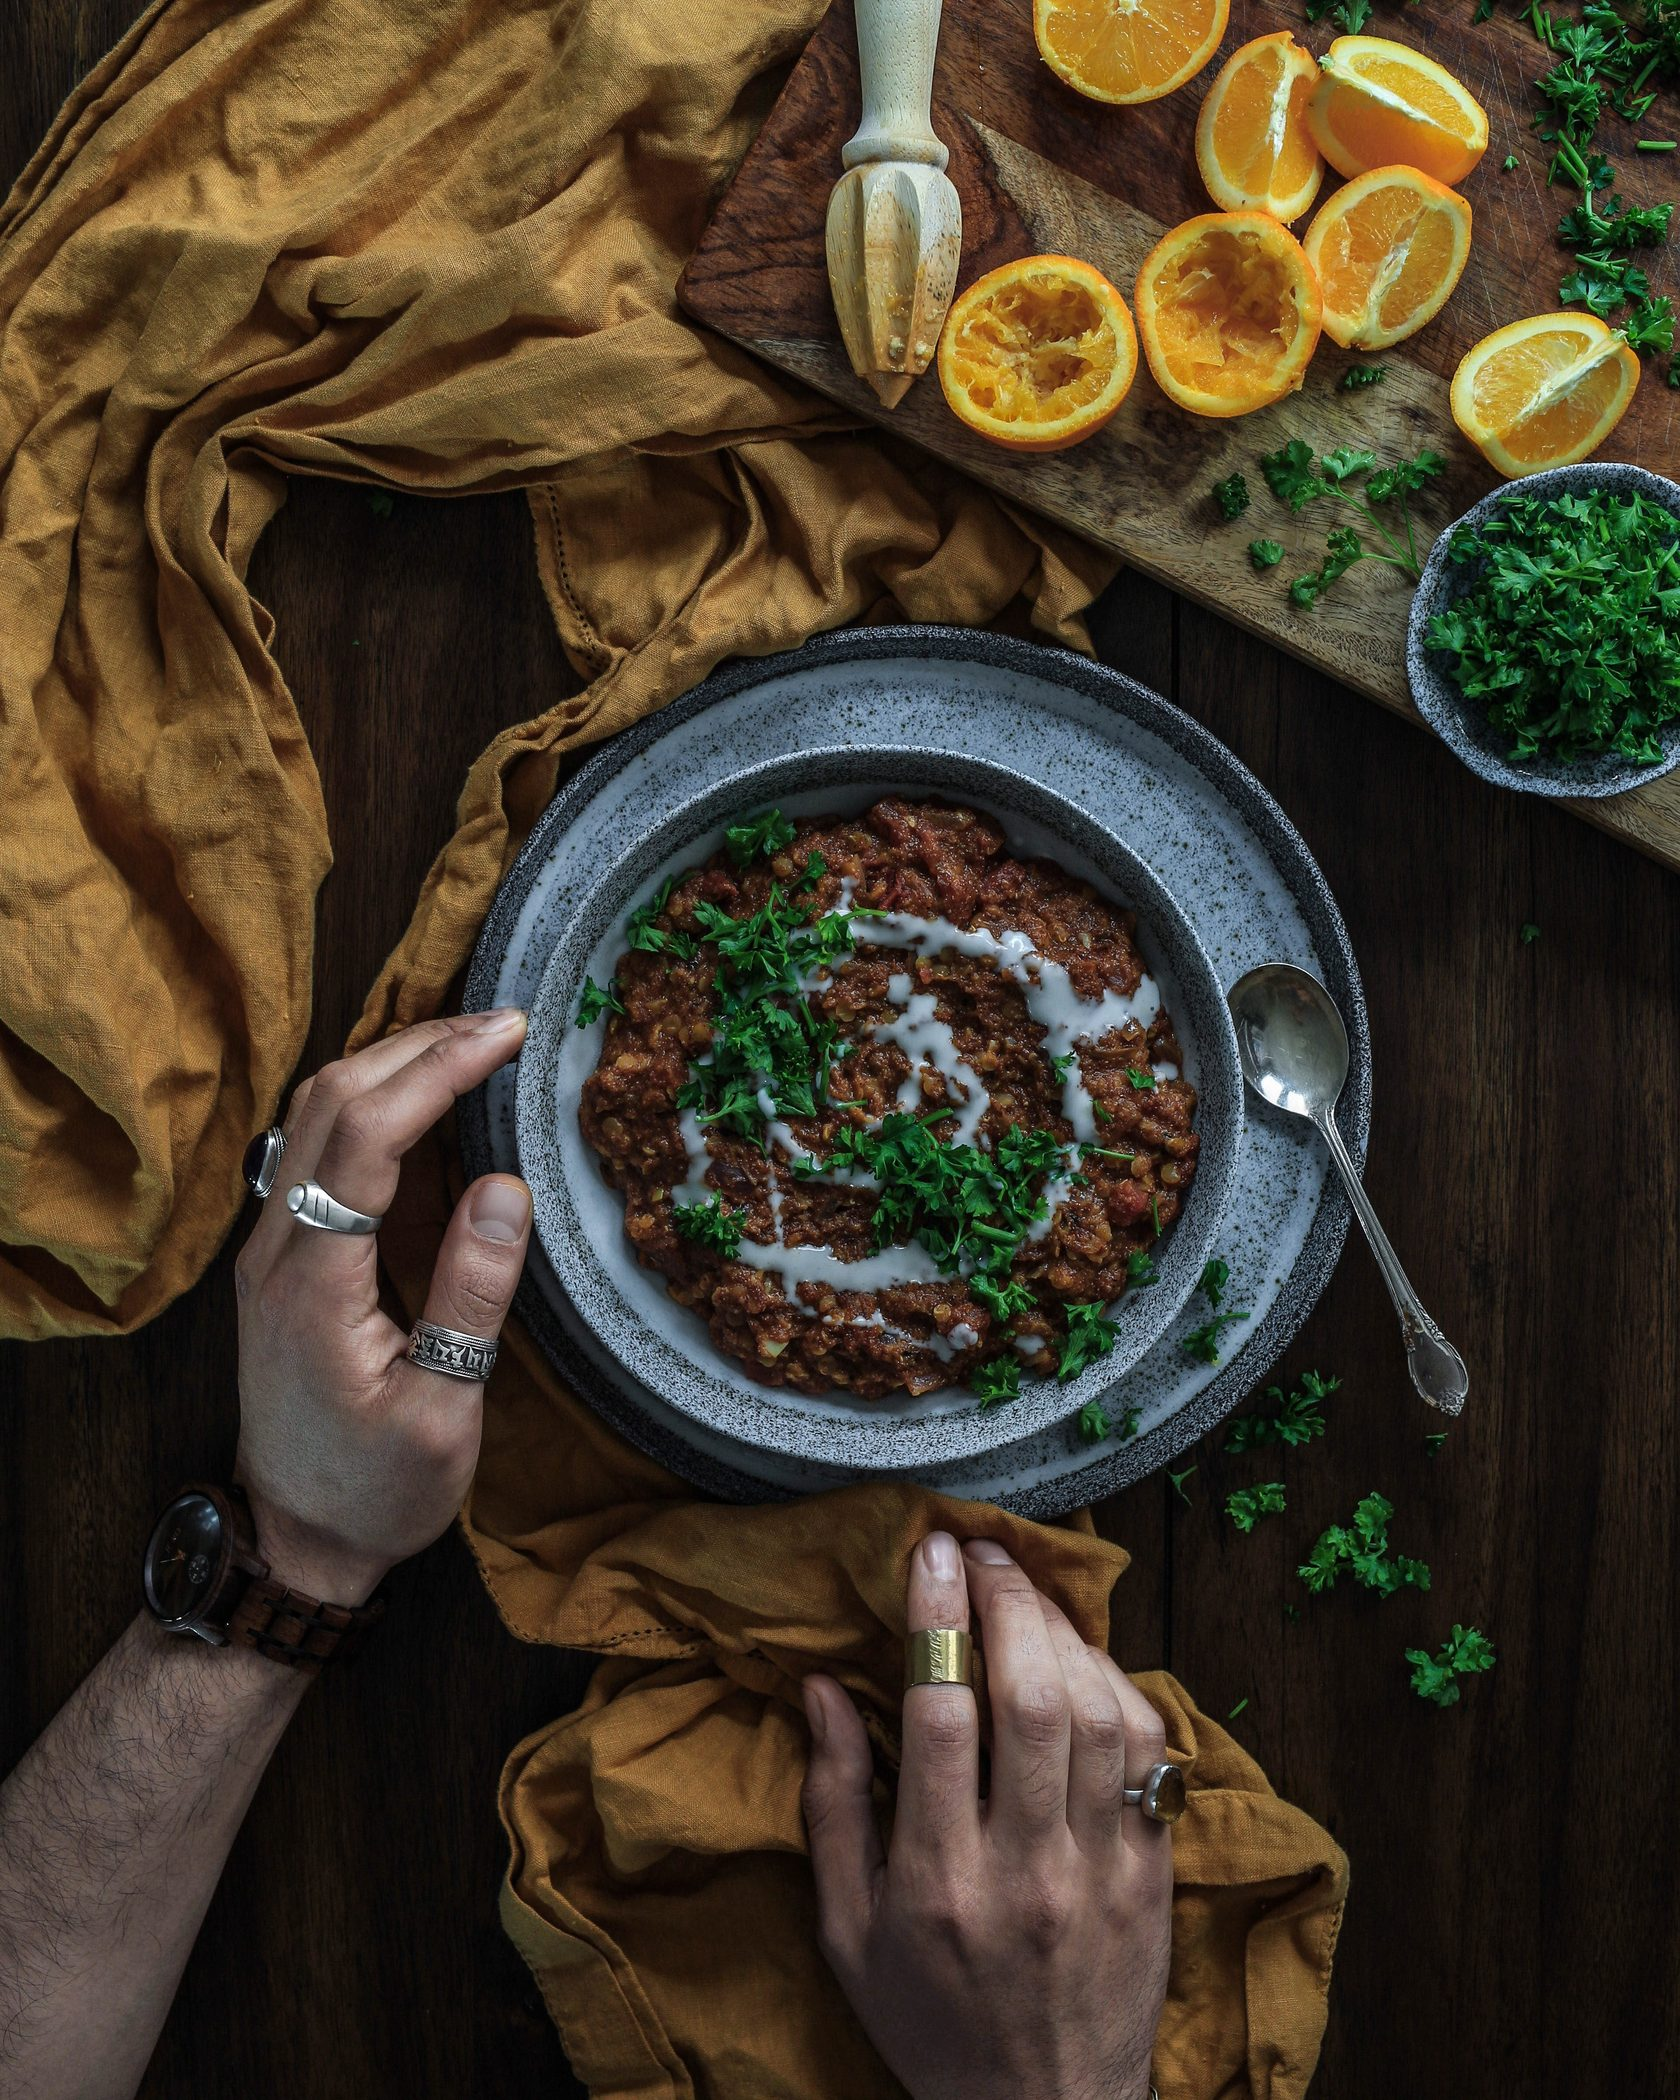 6 Amazing Cuisines to Try in Delhi, India